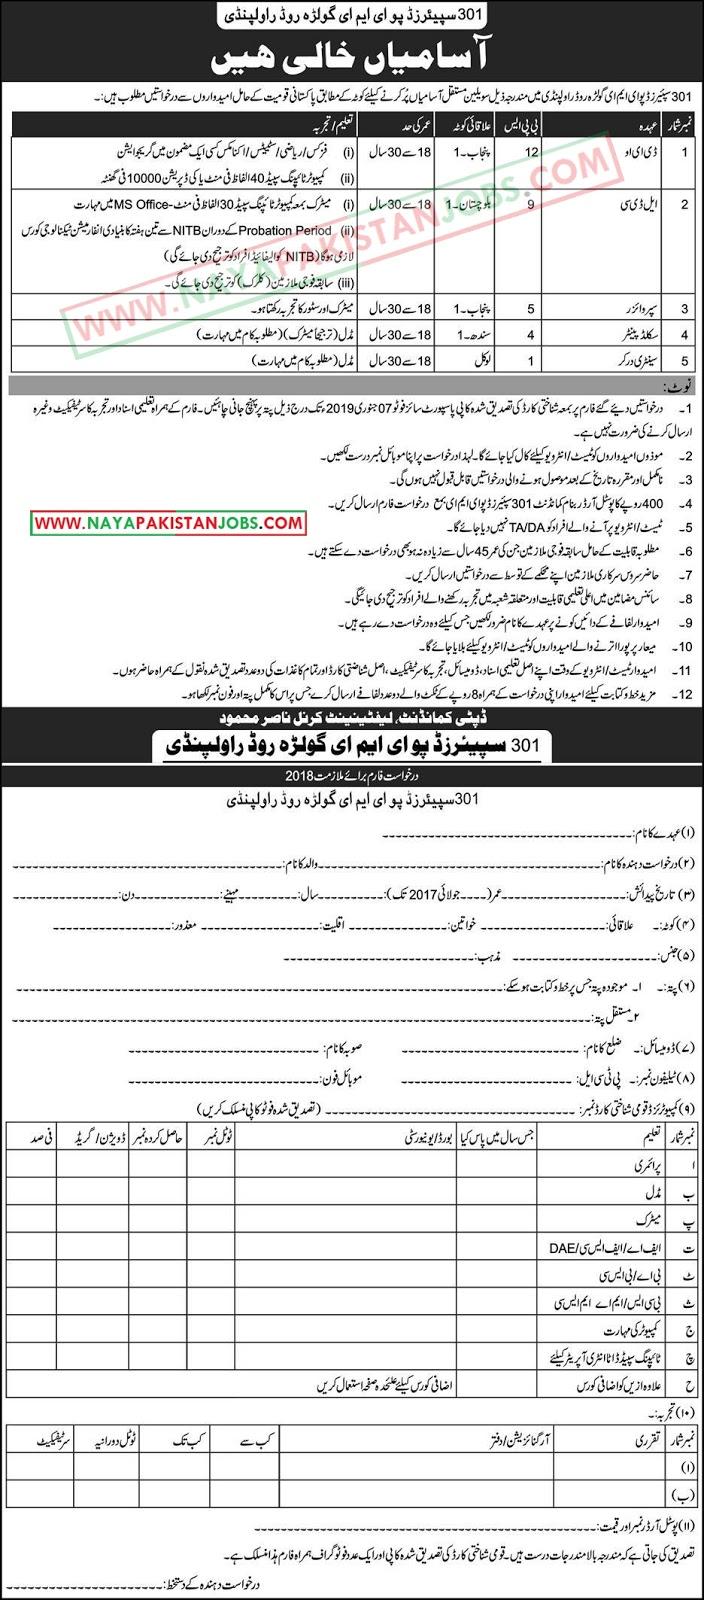 Pak Army Jobs Rawalpindi Dec 2018 | 301 Spares Depot EME army Jobs, Pak Army Jobs in rawalpindi , army jobs application form download